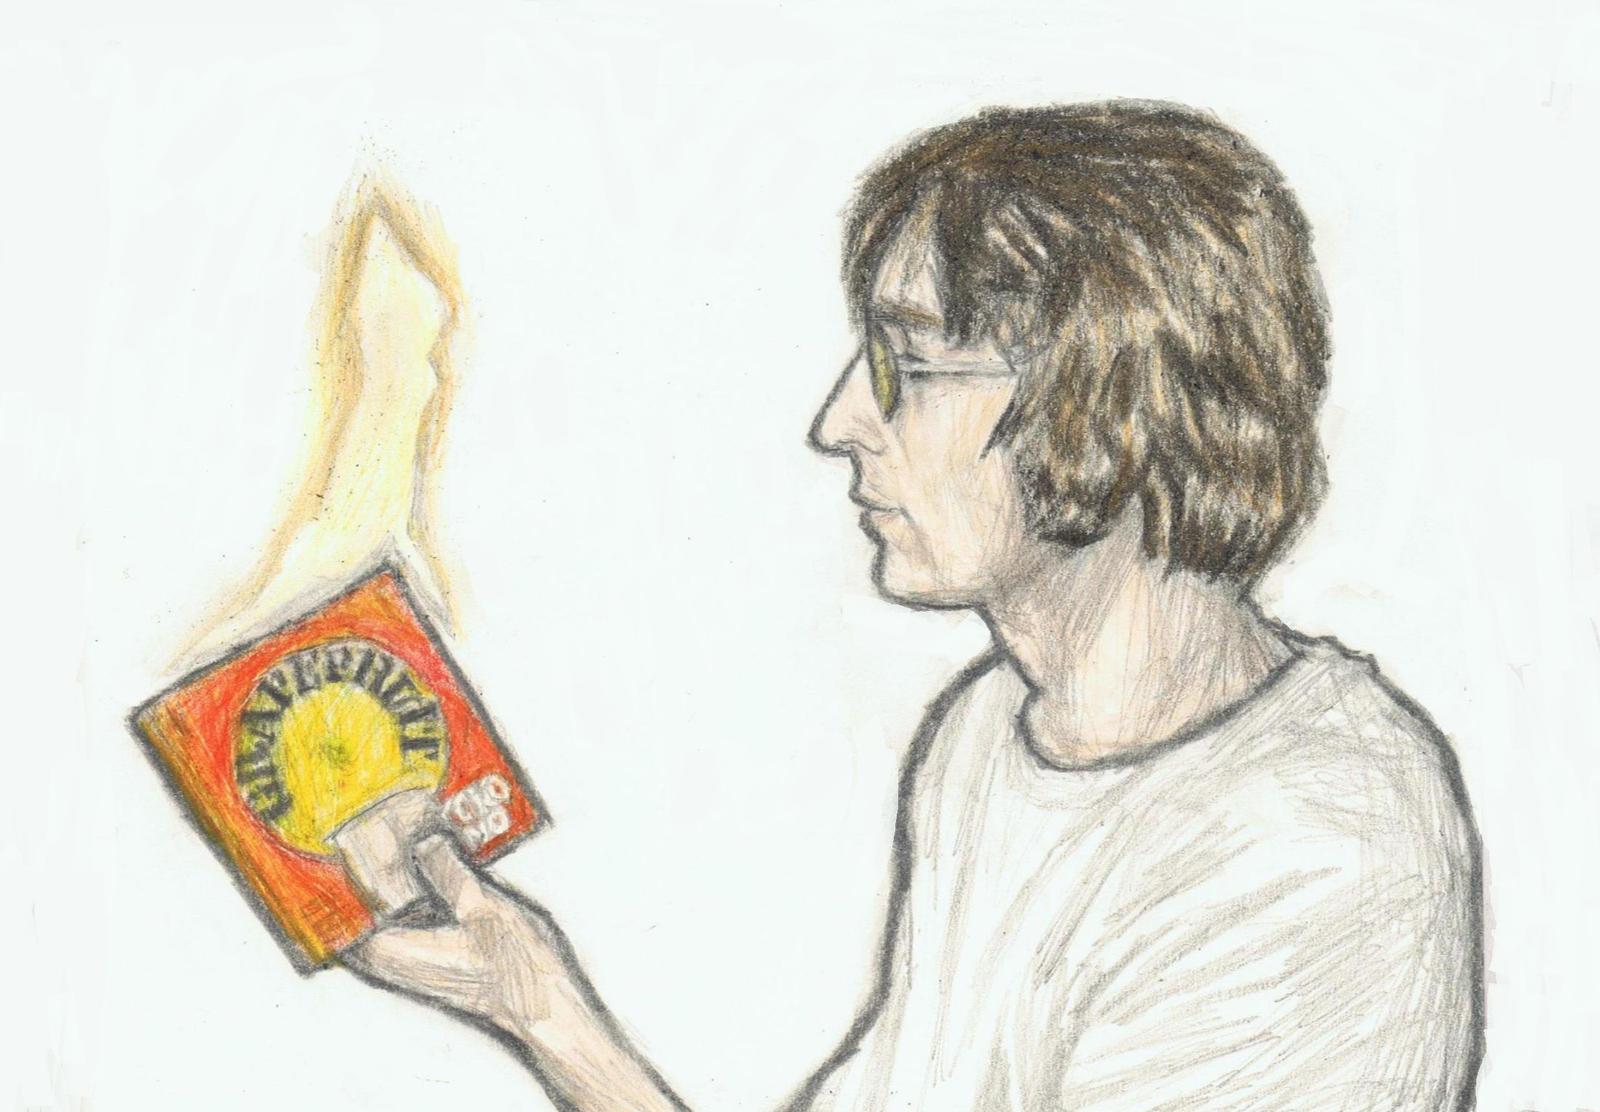 John Lennon and Yoko Ono by margo98 on DeviantArt |Sketches John Lennon And Yoko Ono